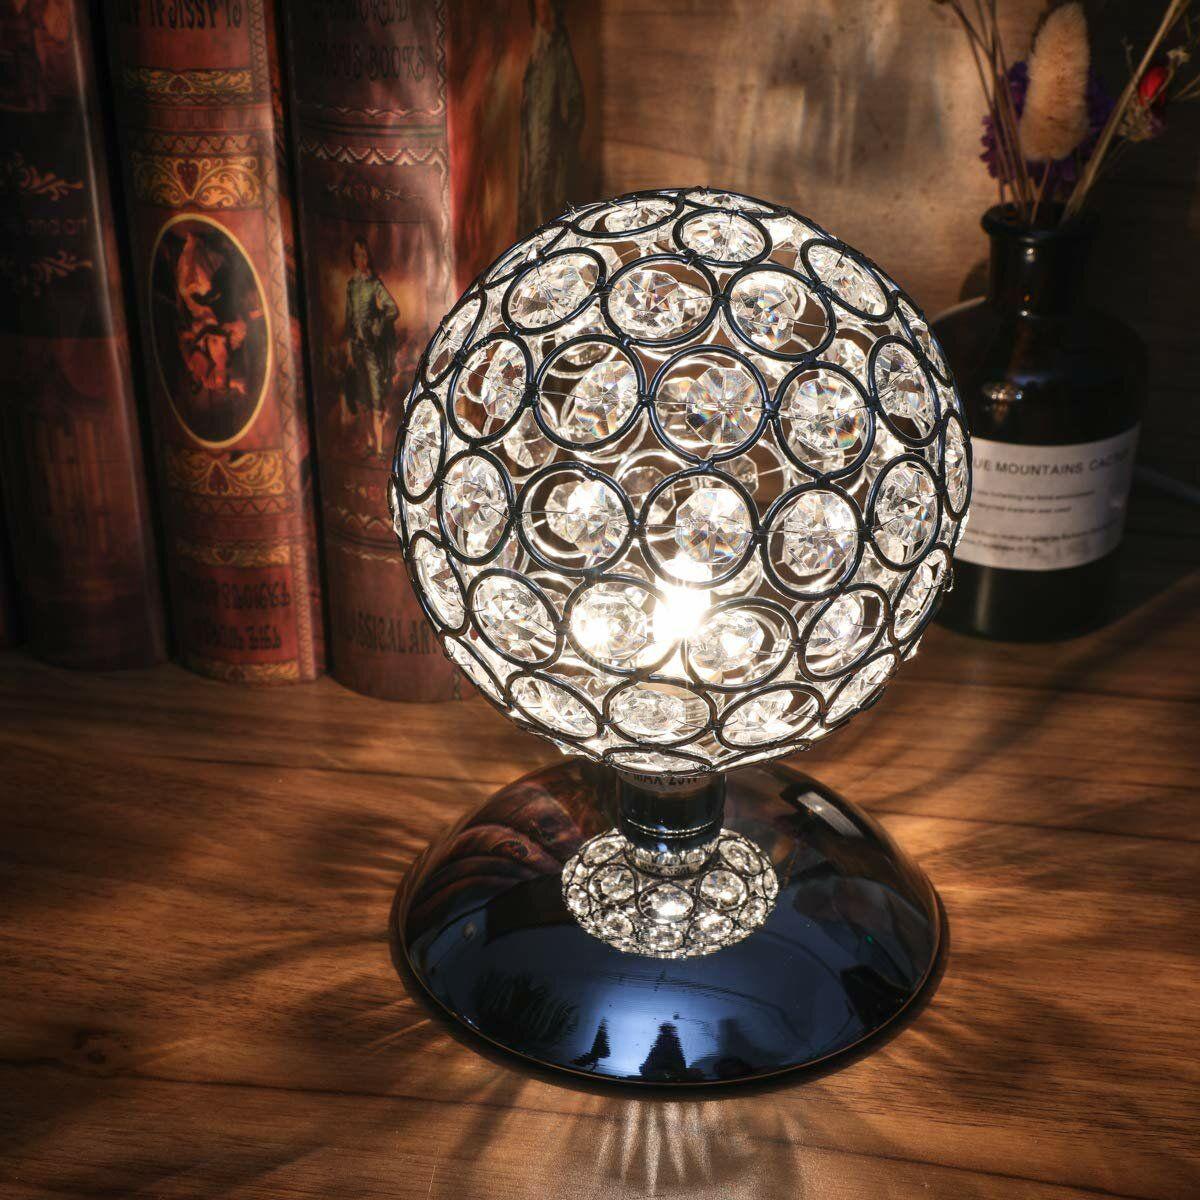 Modern Crystal Ball Table Lamp Night Light Bedroom Bedside Desk Lamp Touch